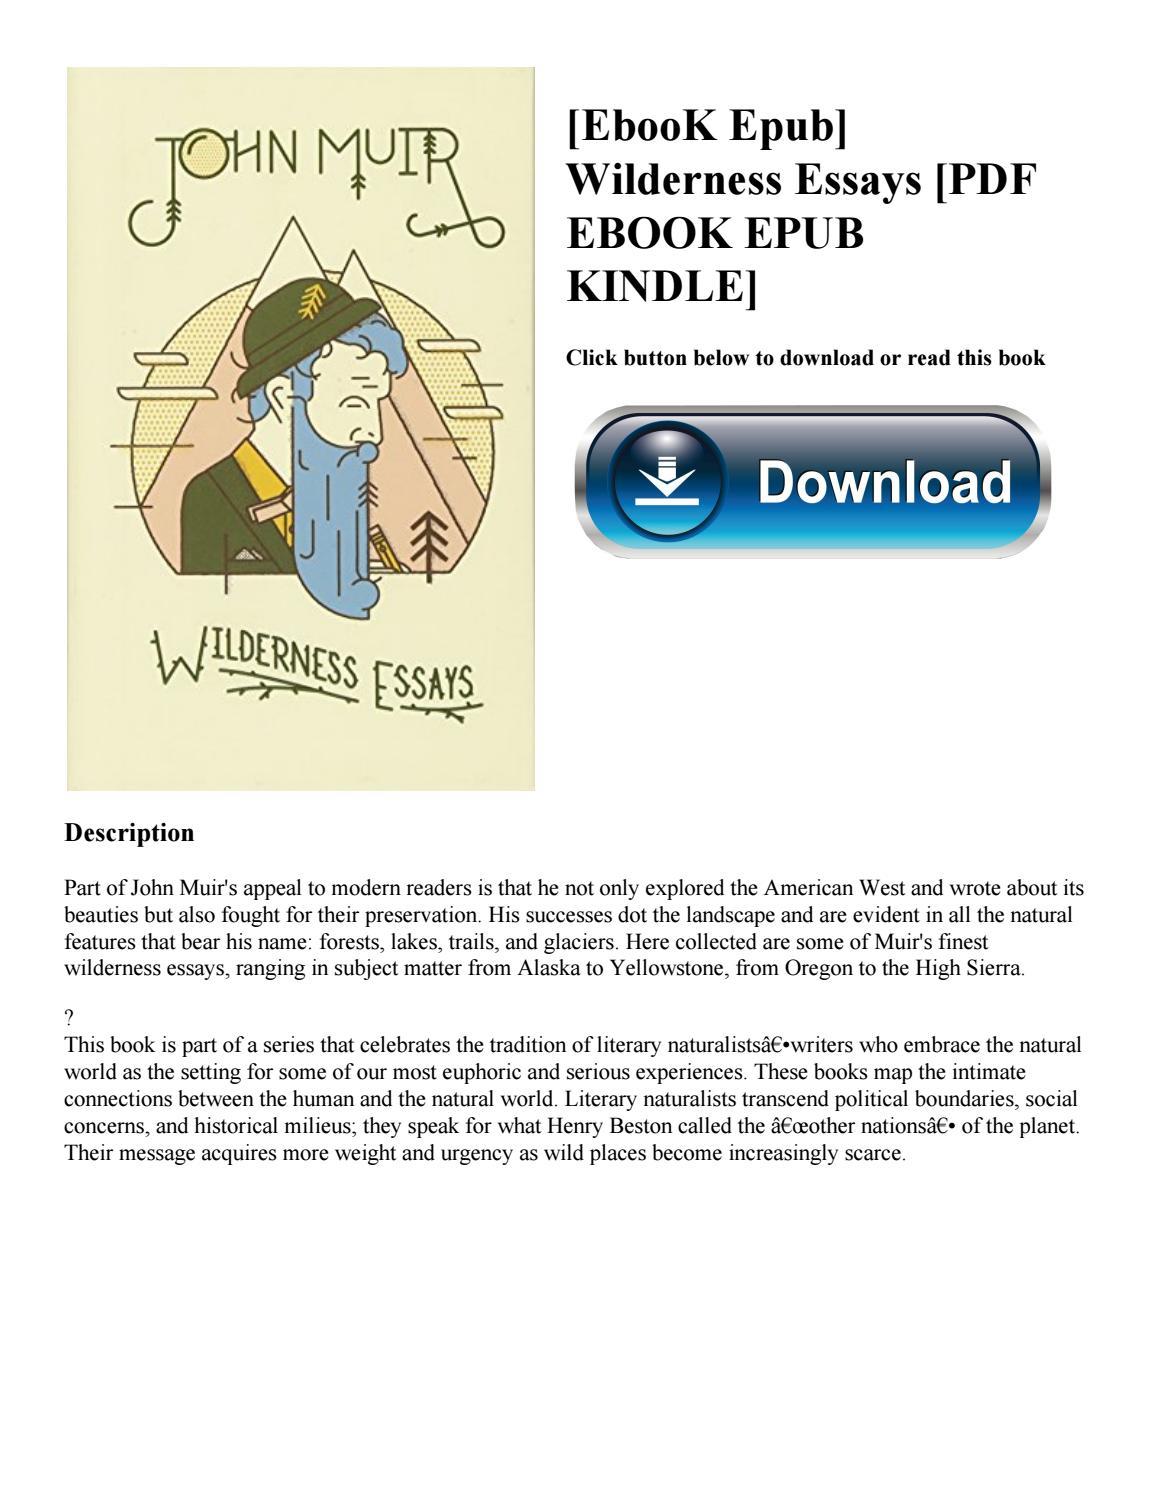 019 John Muir Wilderness Essays Page 1 Essay Best Pdf Review Full